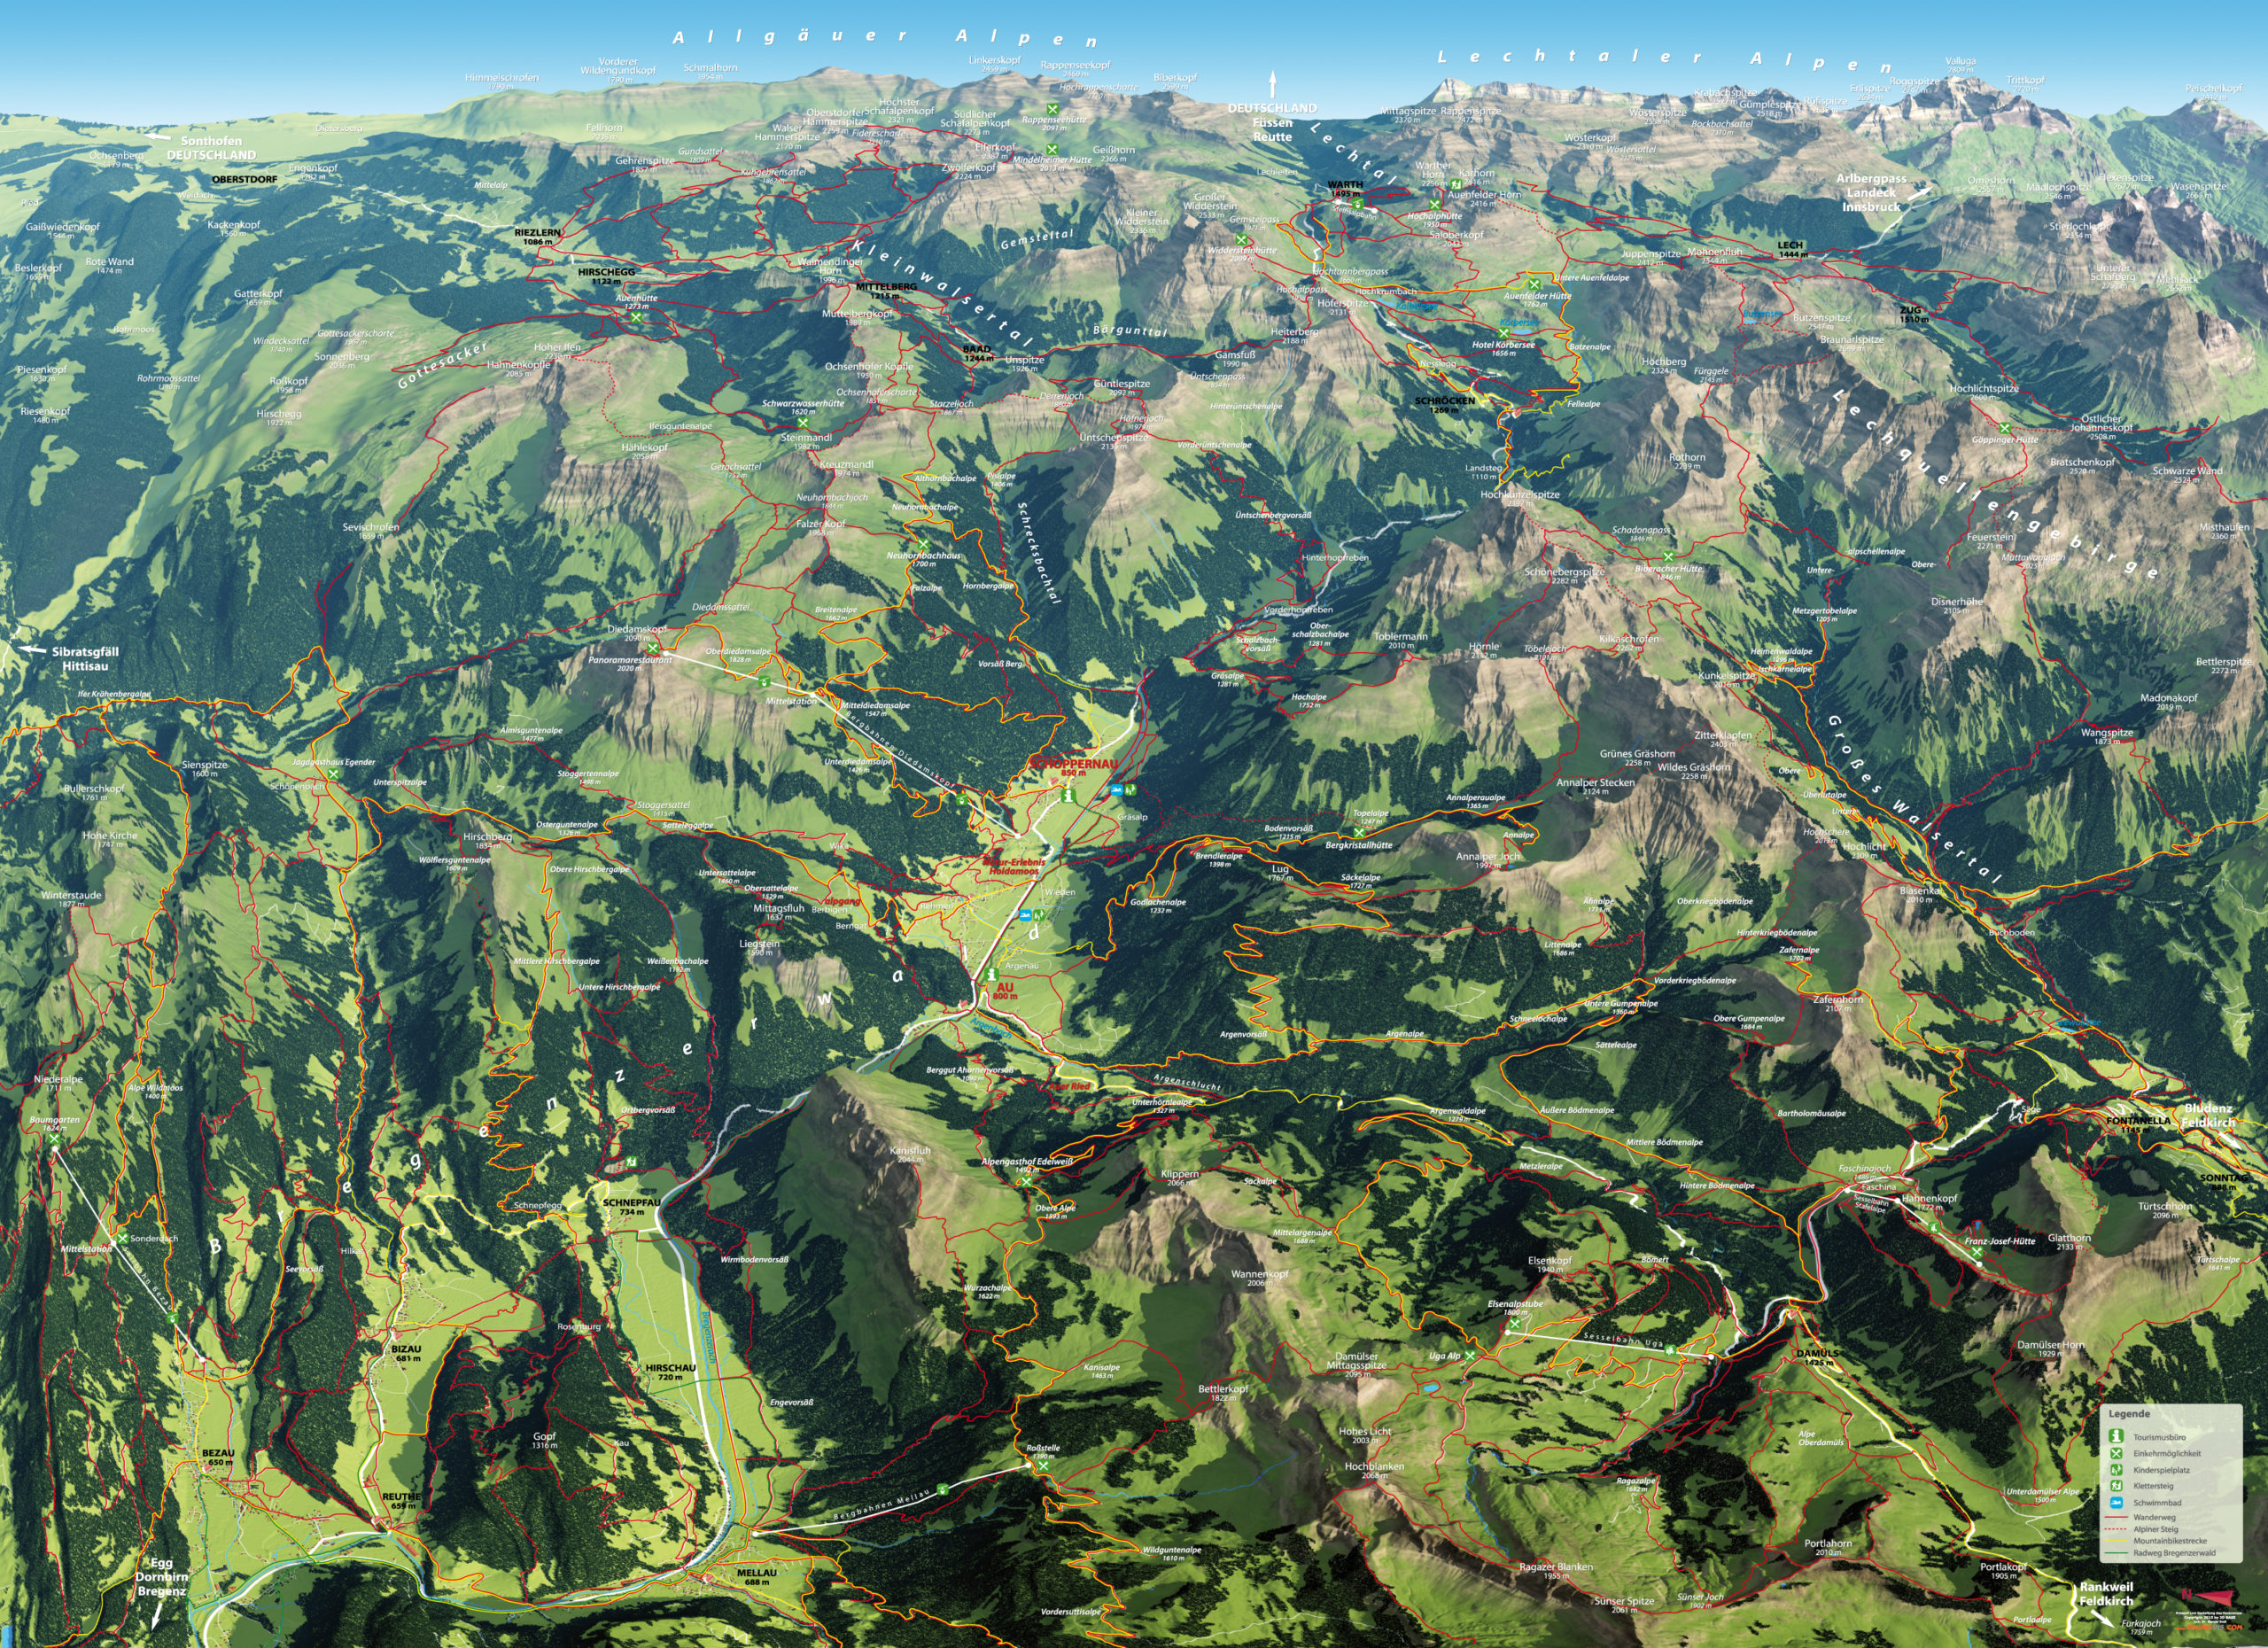 3D Panoramakarte Wandern Biken Au-Schoppernau